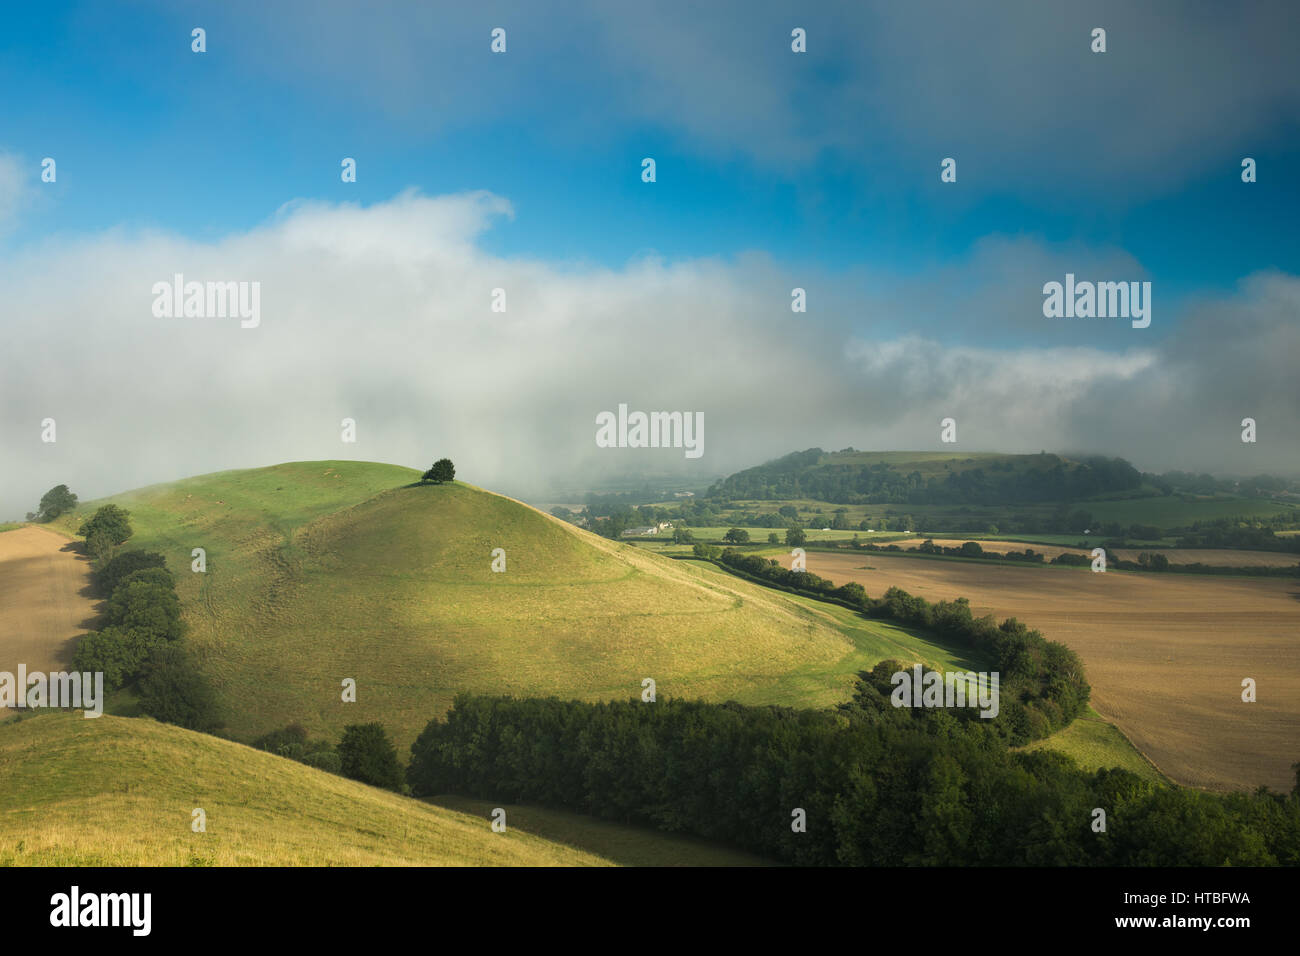 A misty morning on Corton Denham Beacon looking towards Cadbury Castle, Somerset, England, UK - Stock Image